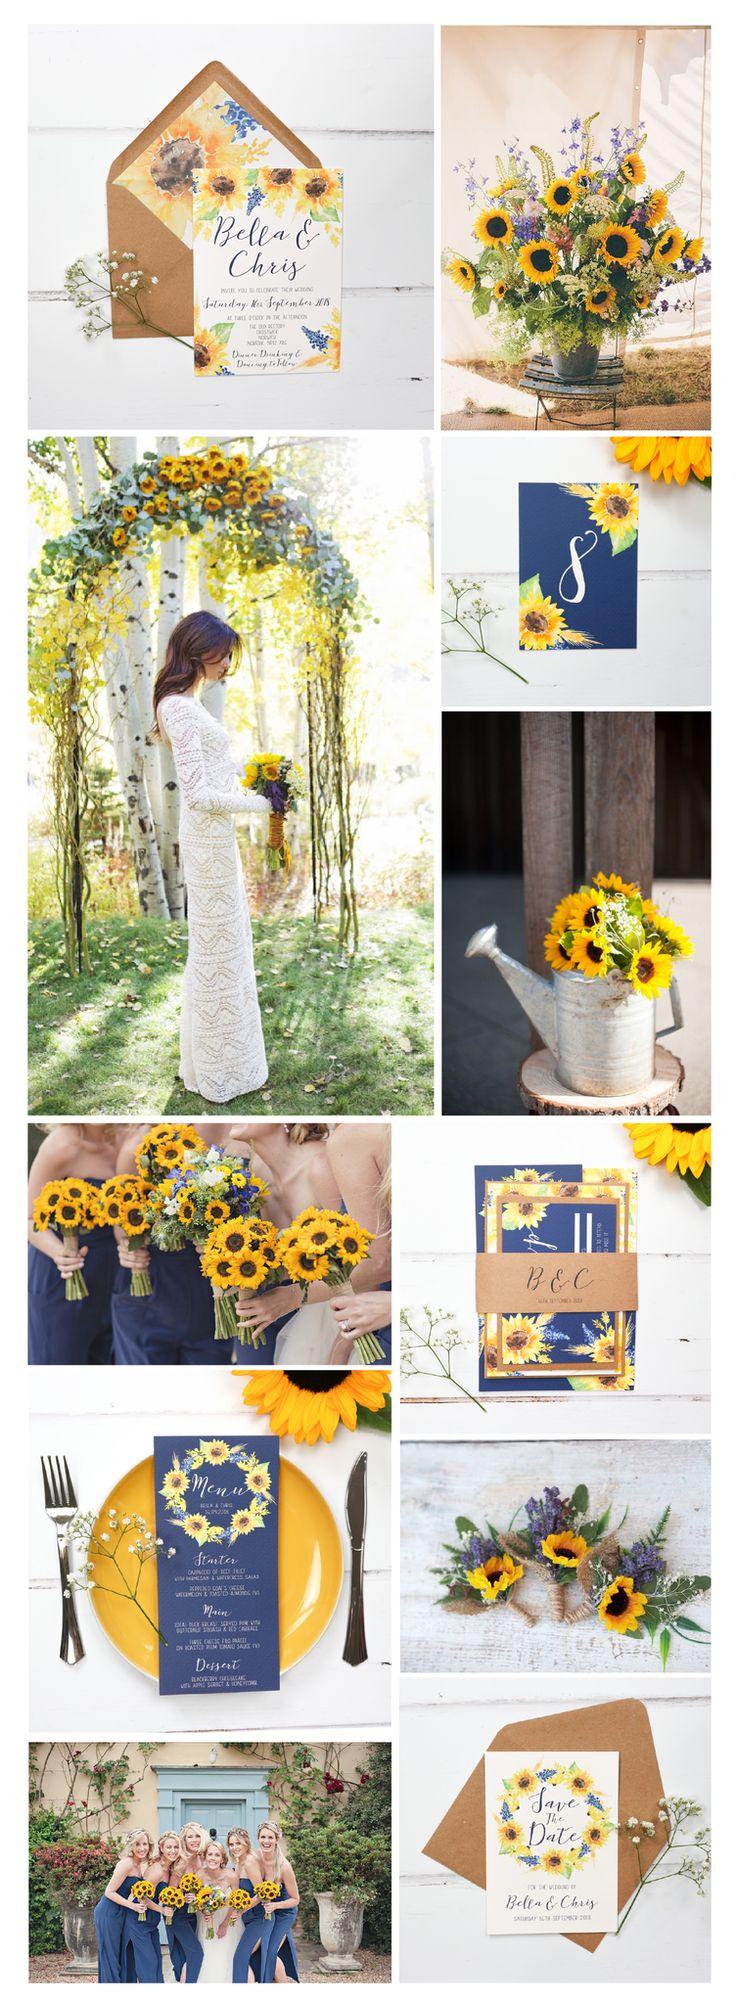 Wedding Day Program Sunflower wedding, Wedding colors